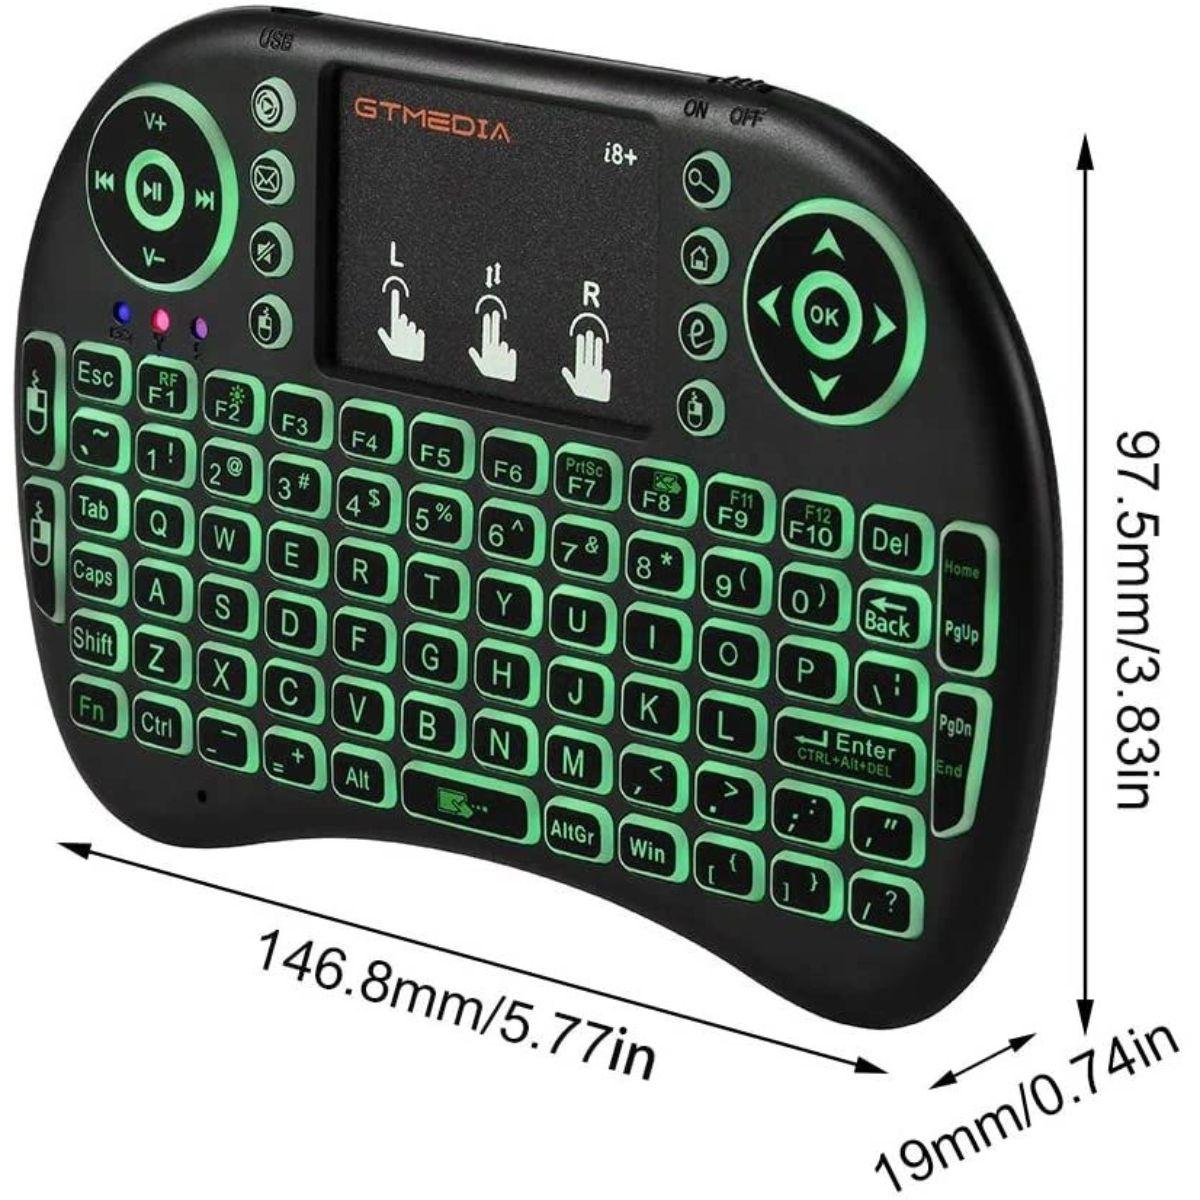 mini teclado inalambrico con panel tactil retroiluminado 3 1 1